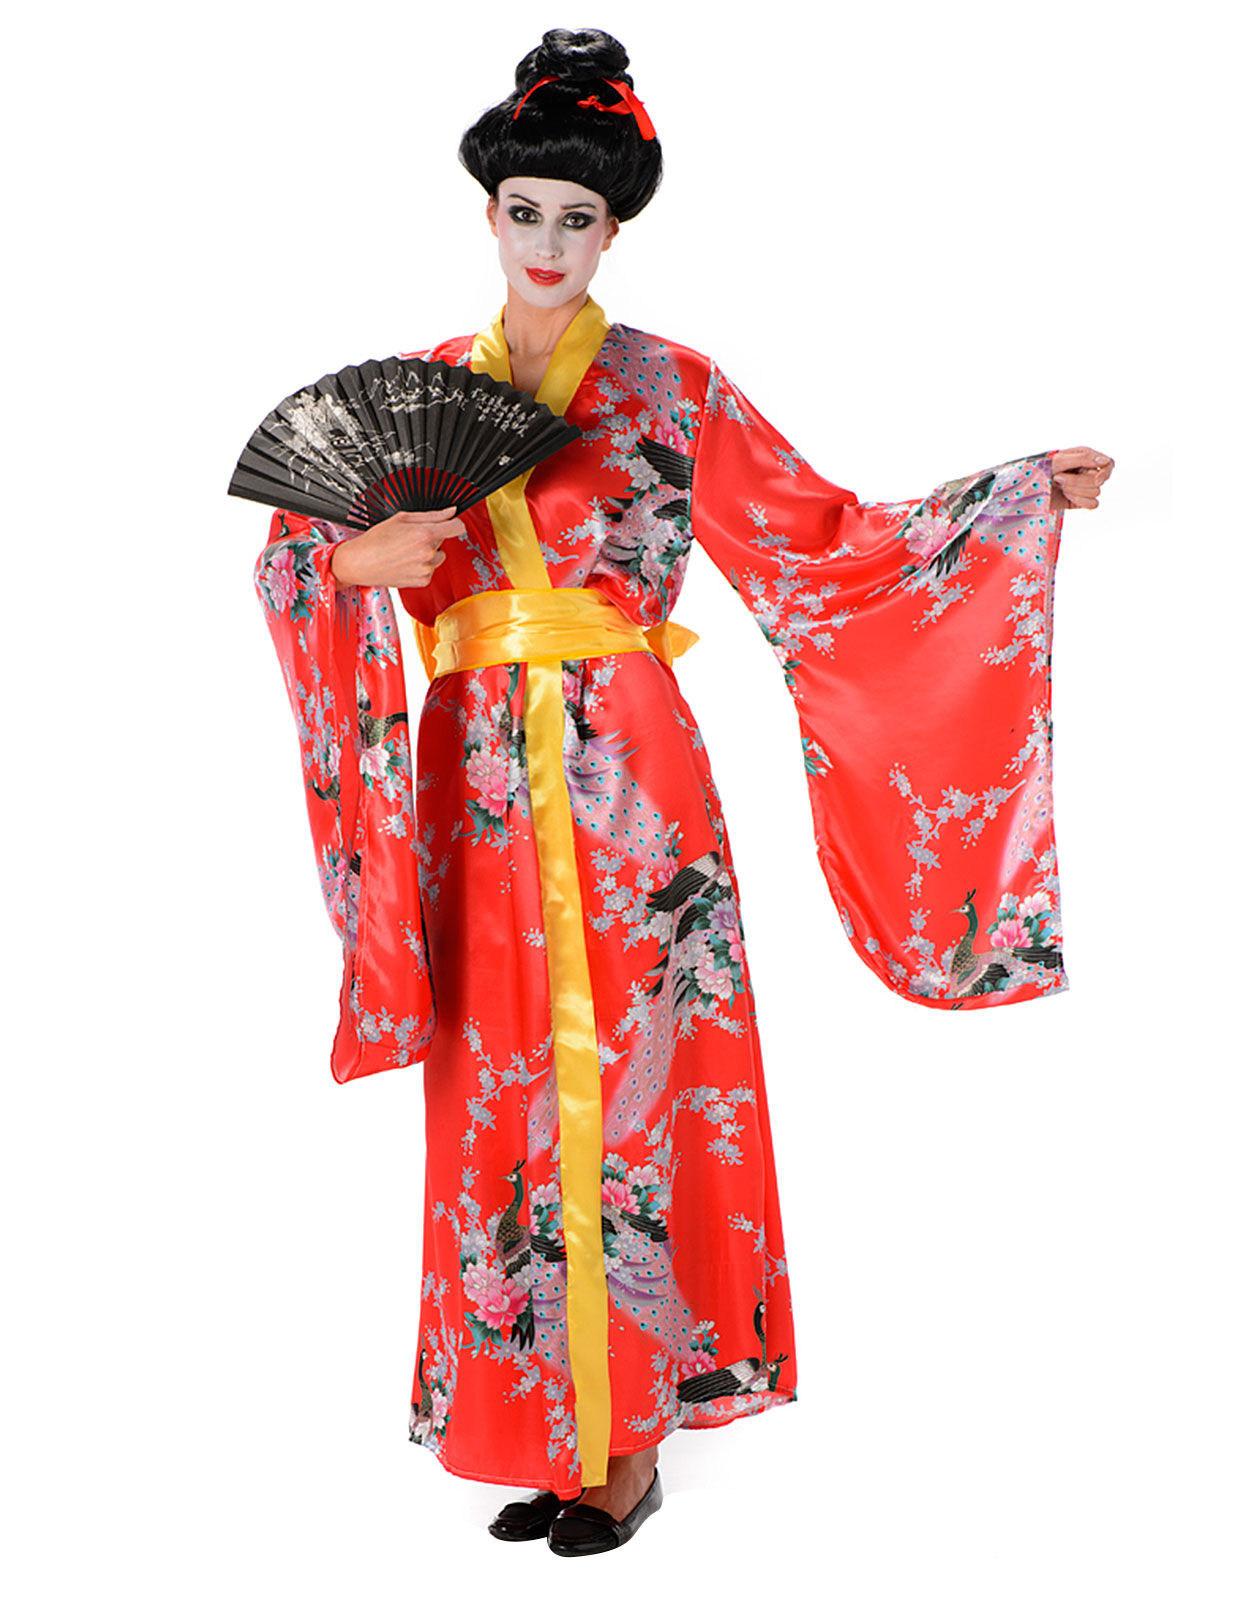 geisha kost m rot f r damen kost me f r erwachsene und g nstige faschingskost me vegaoo. Black Bedroom Furniture Sets. Home Design Ideas